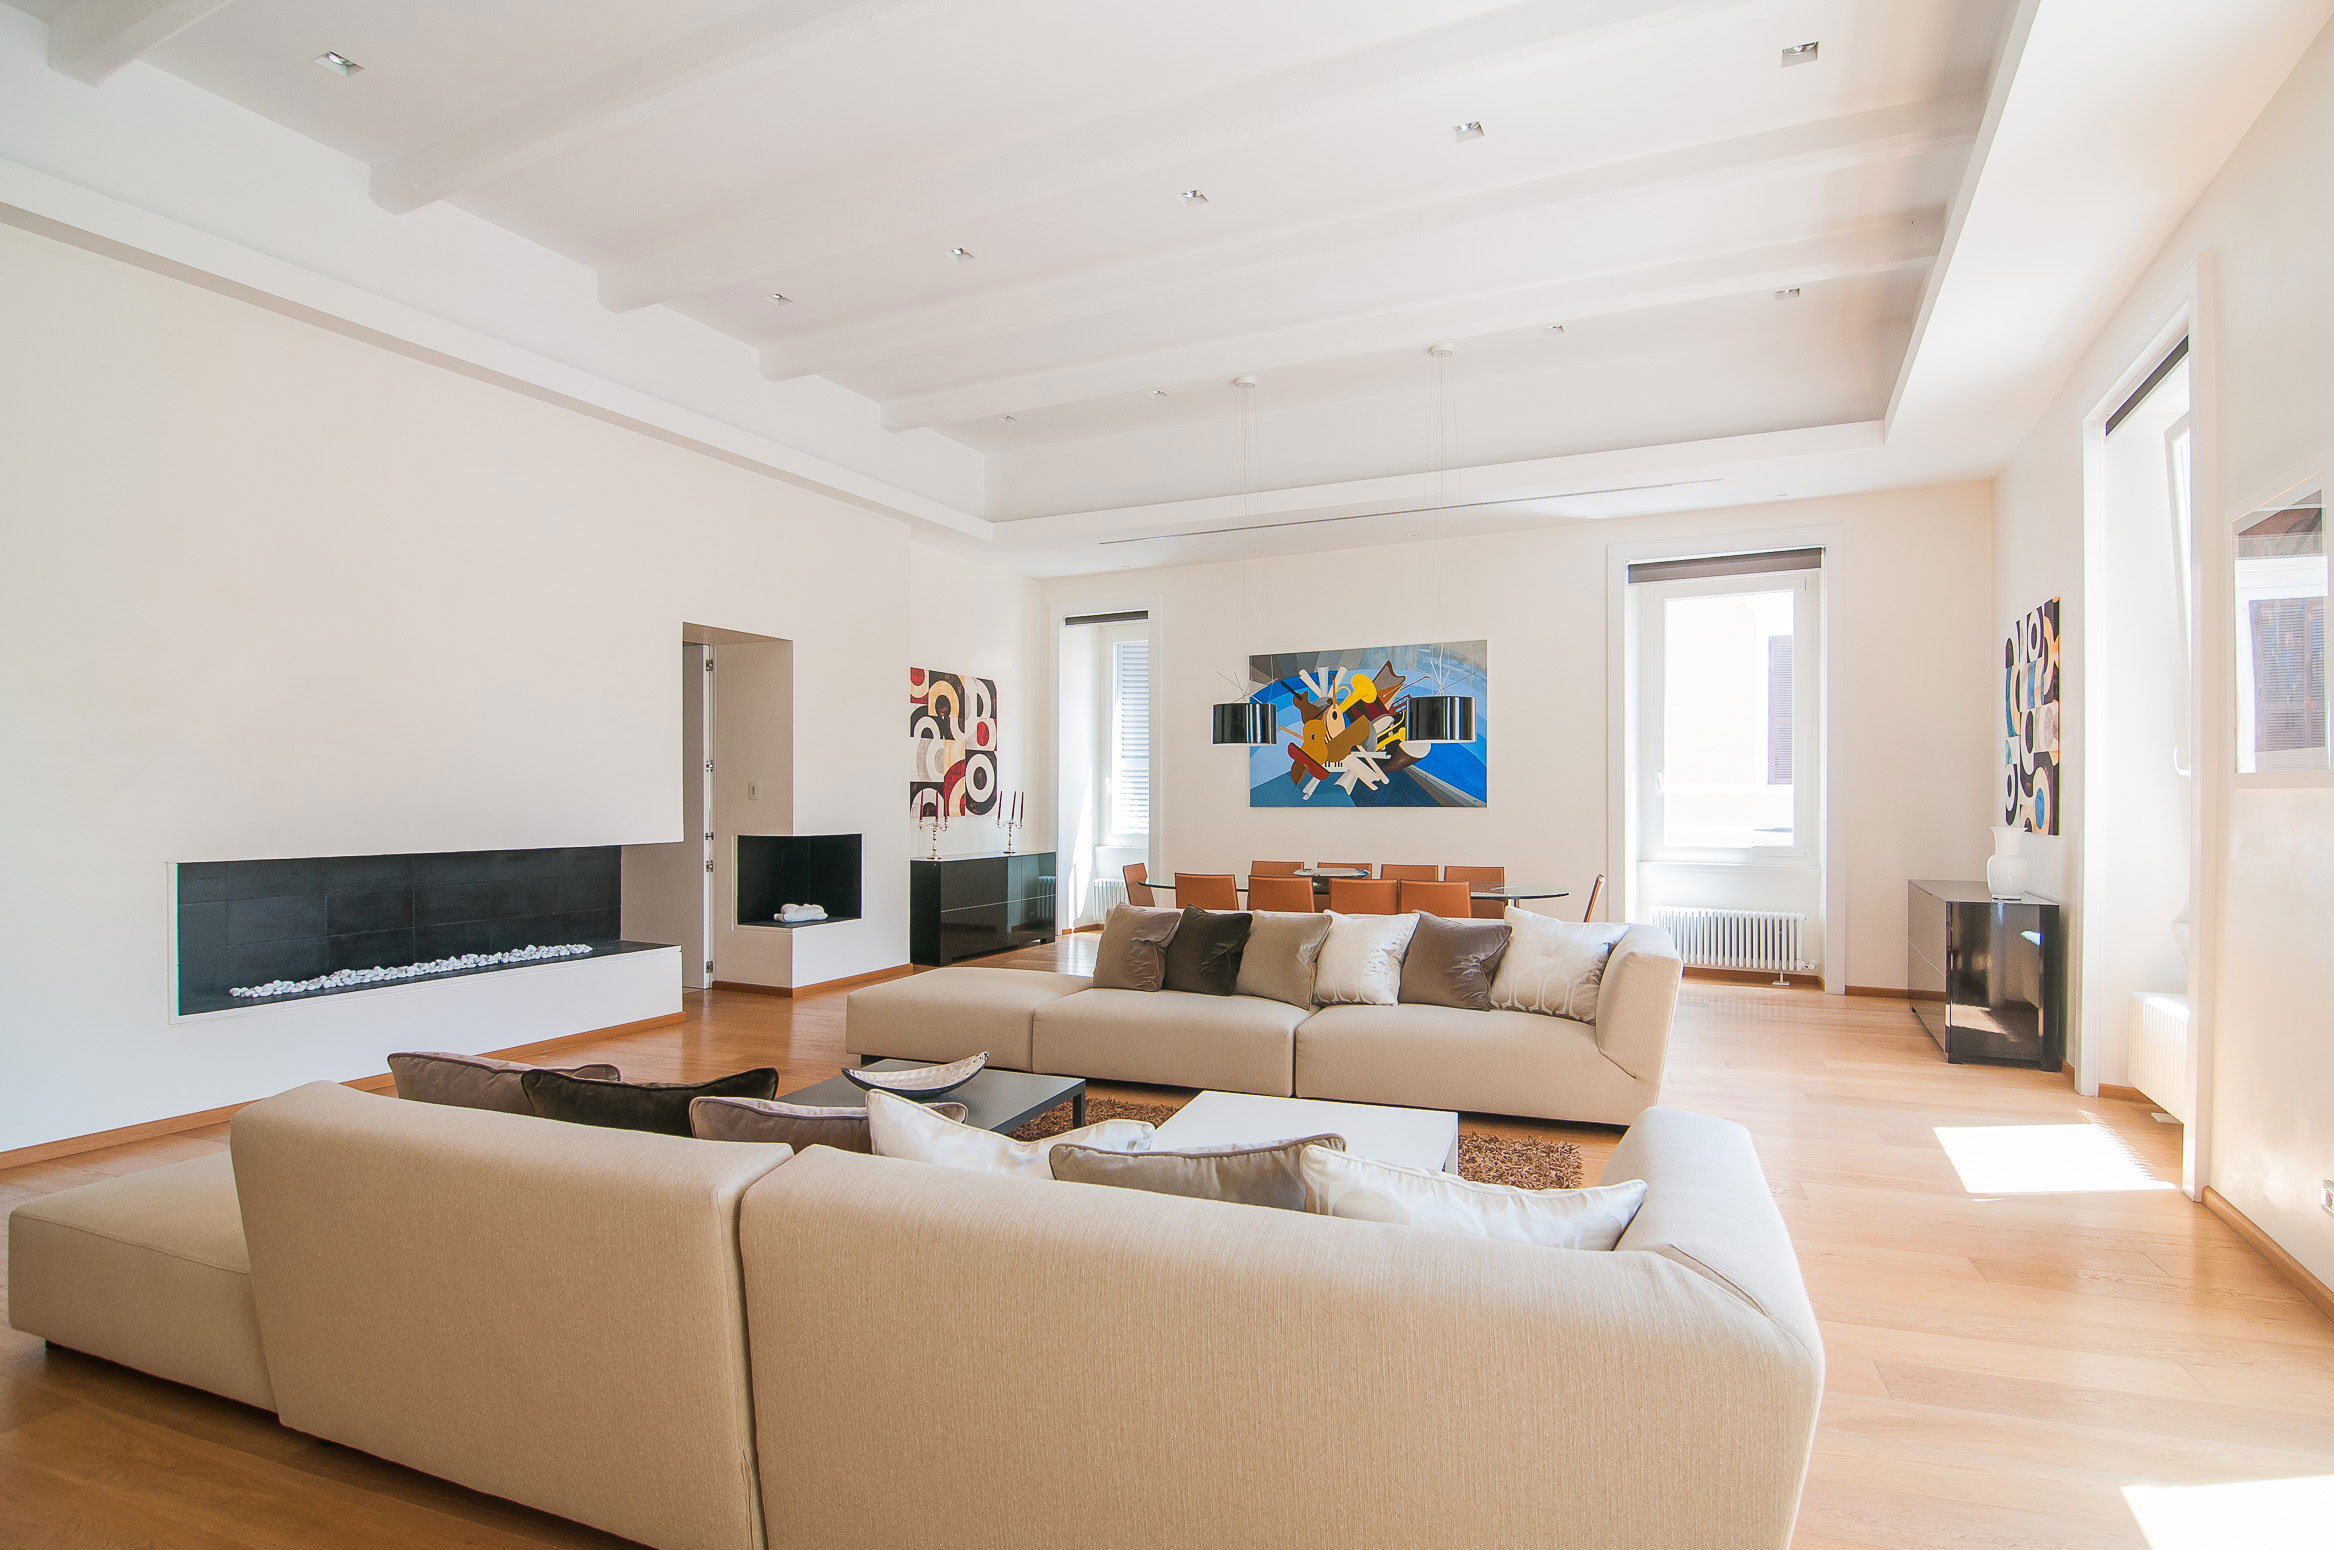 CM Apartment in Rome by 3C+t Capolei Cavalli a.a.-09